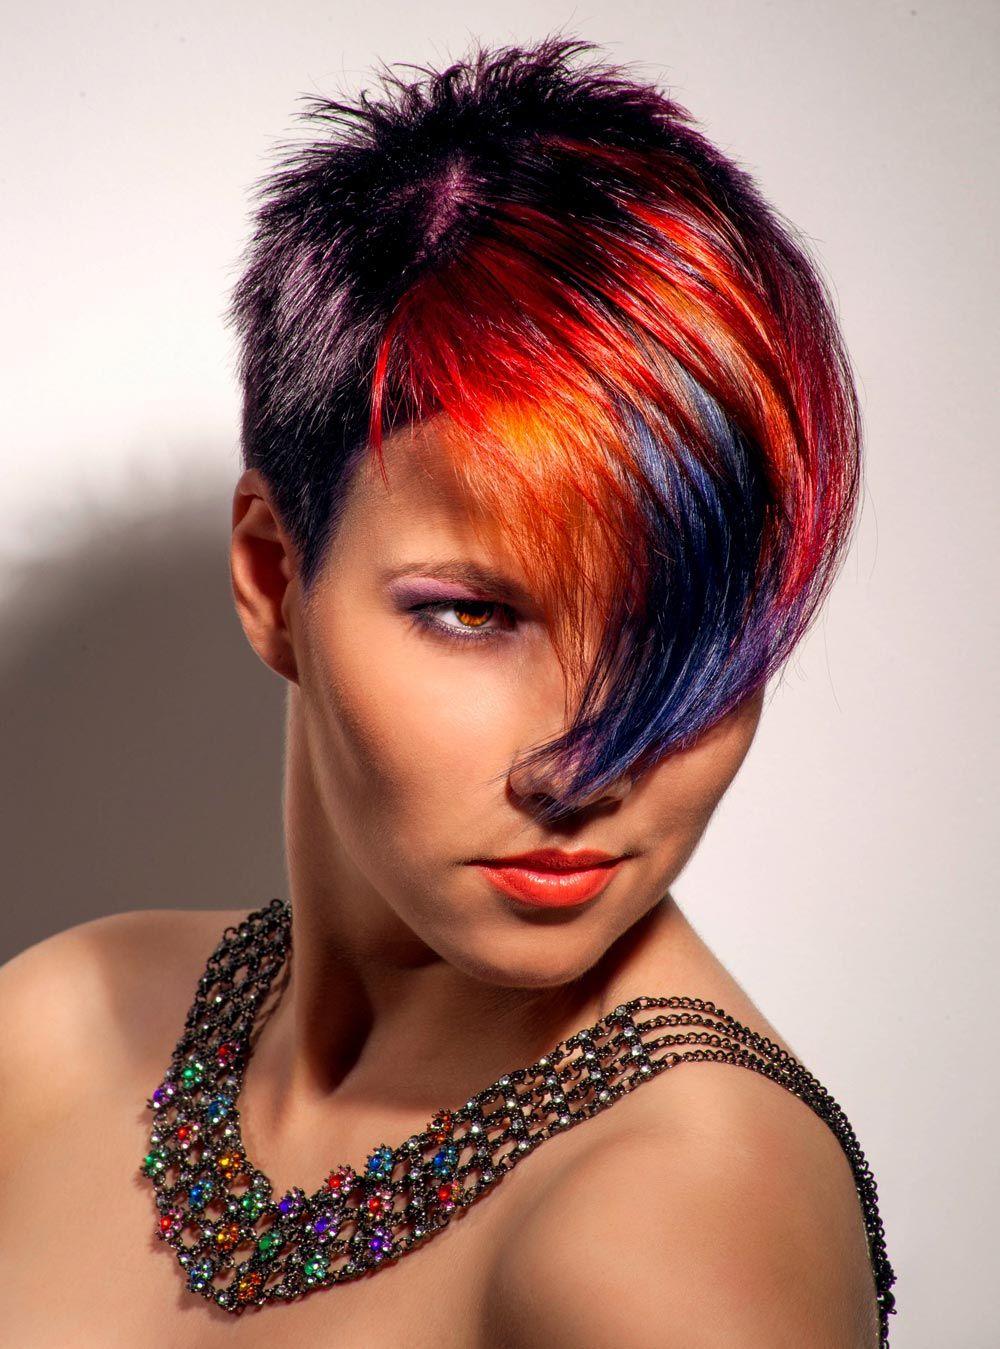 Haare roten kurze strähnchen mit Kurze haare